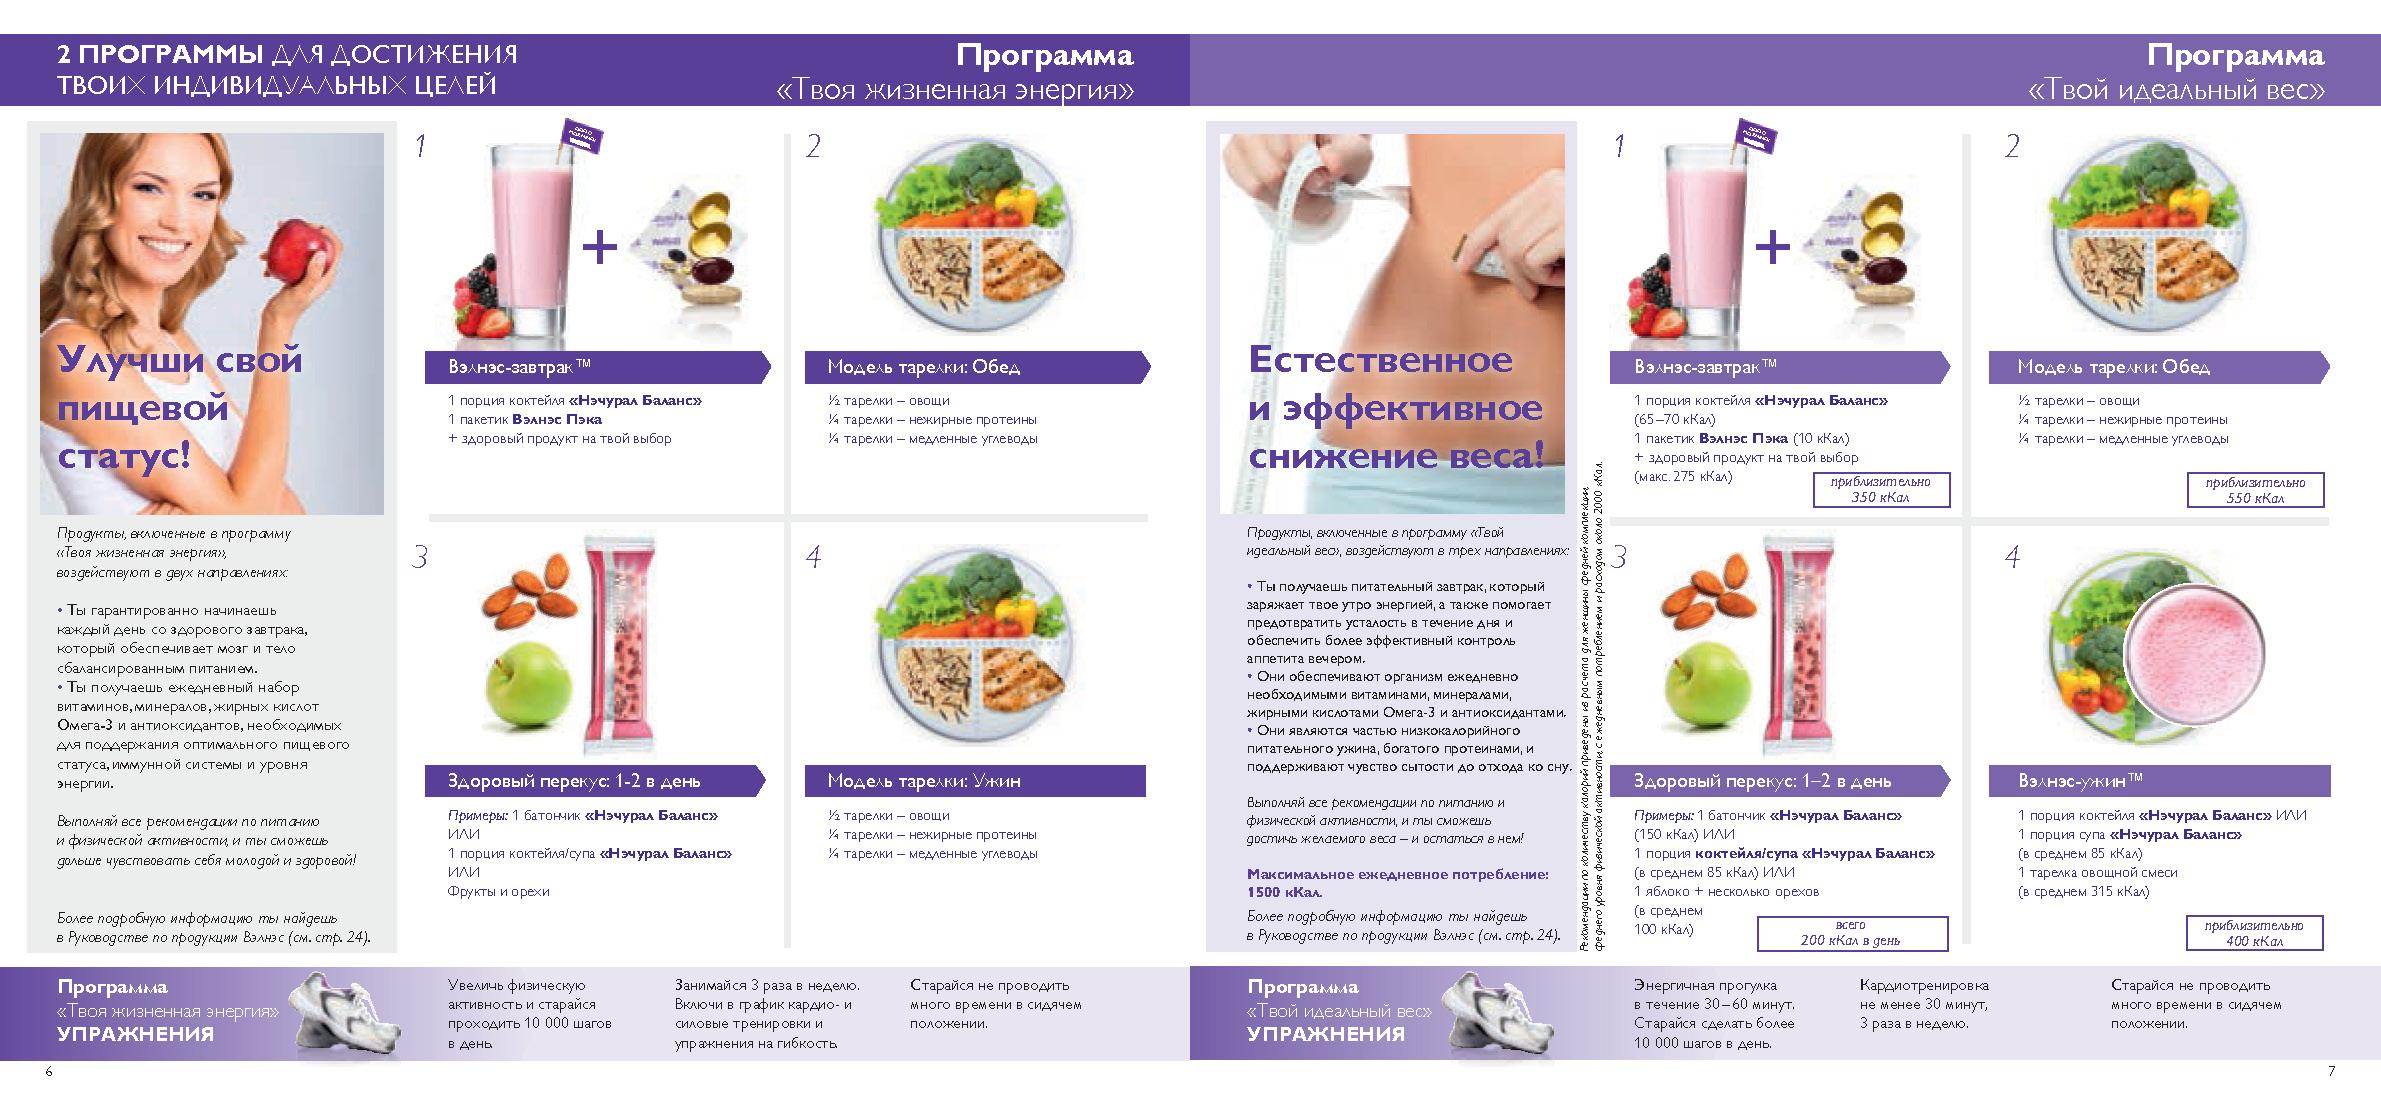 Каталог Wellness by Oriflame. Стань миллионером! с biz-aks.ru